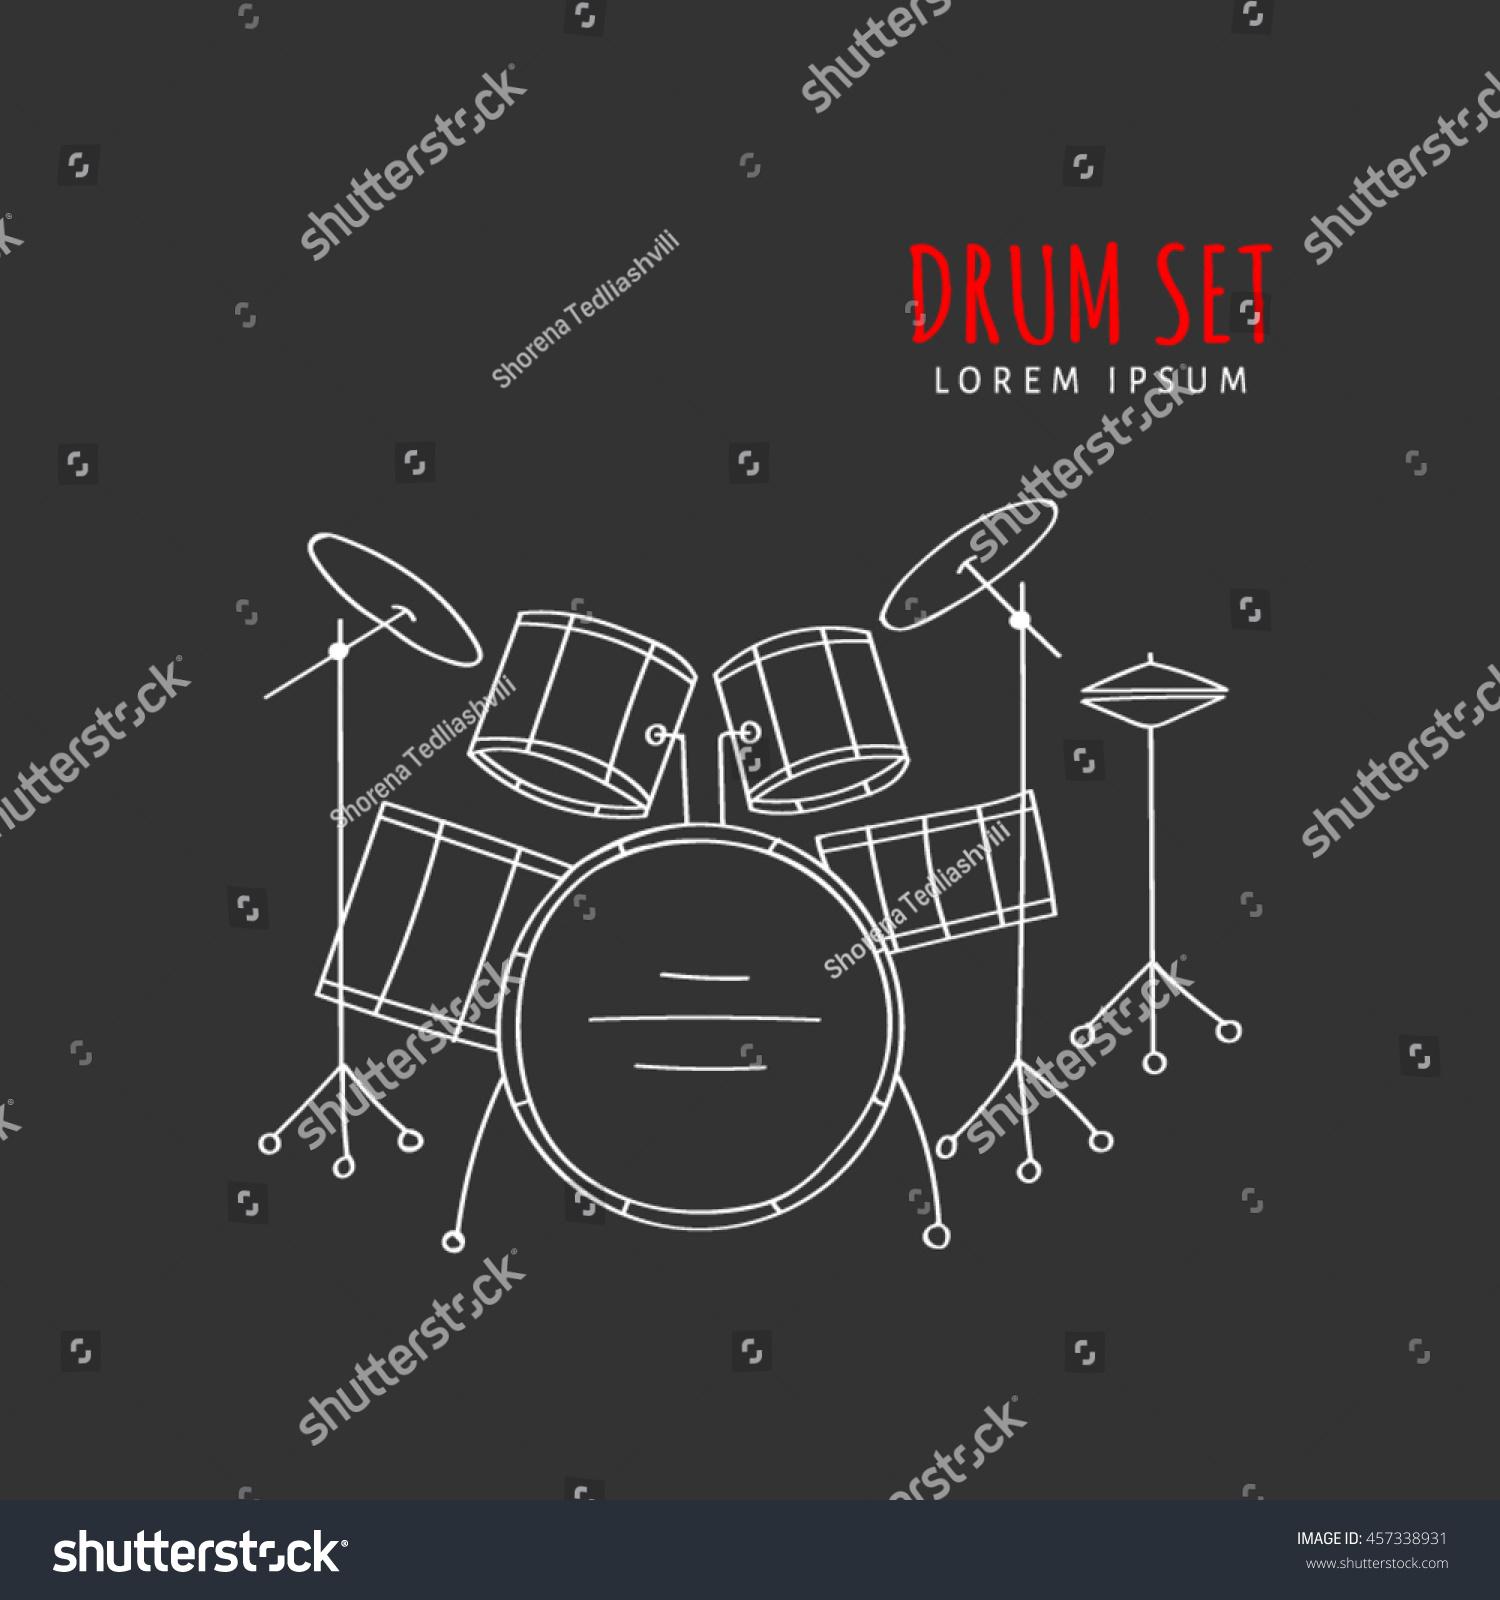 Drum Set Vector Illustration Hand Drawn Stock Vector Royalty Free